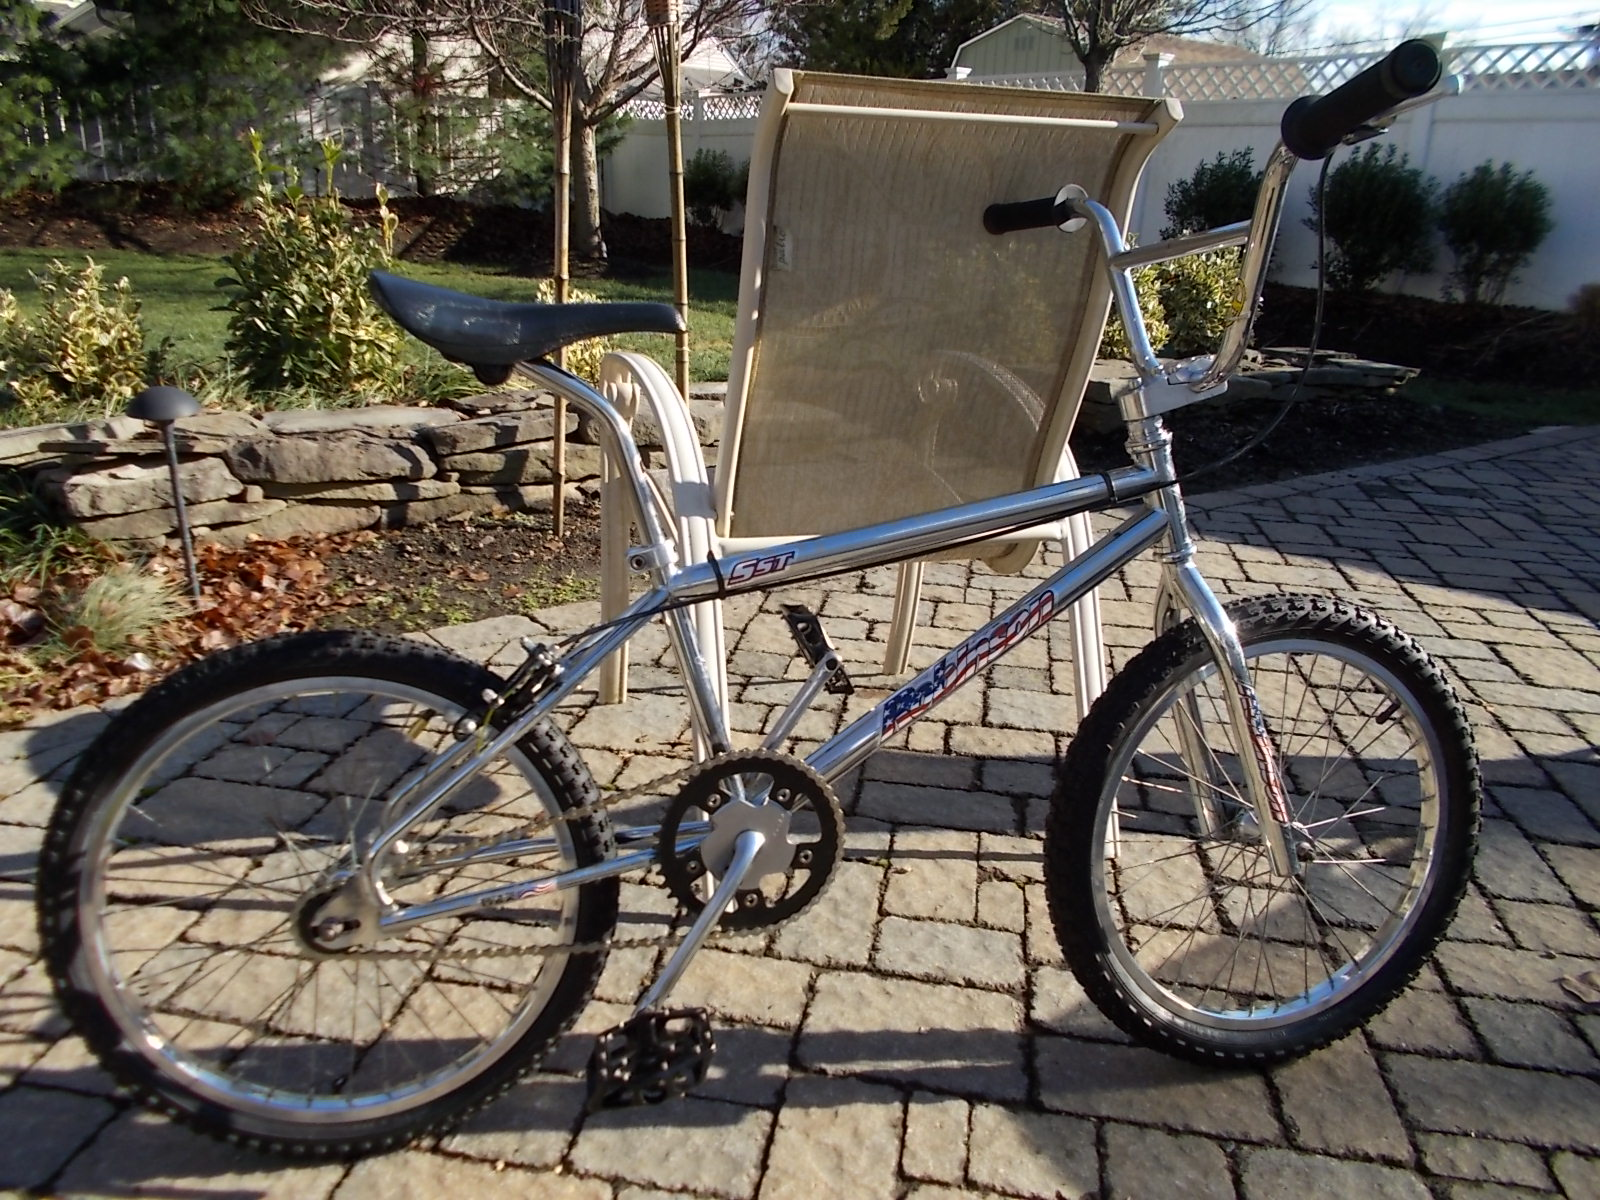 1994 Robinson Sst Bmx Bicycle Restoration